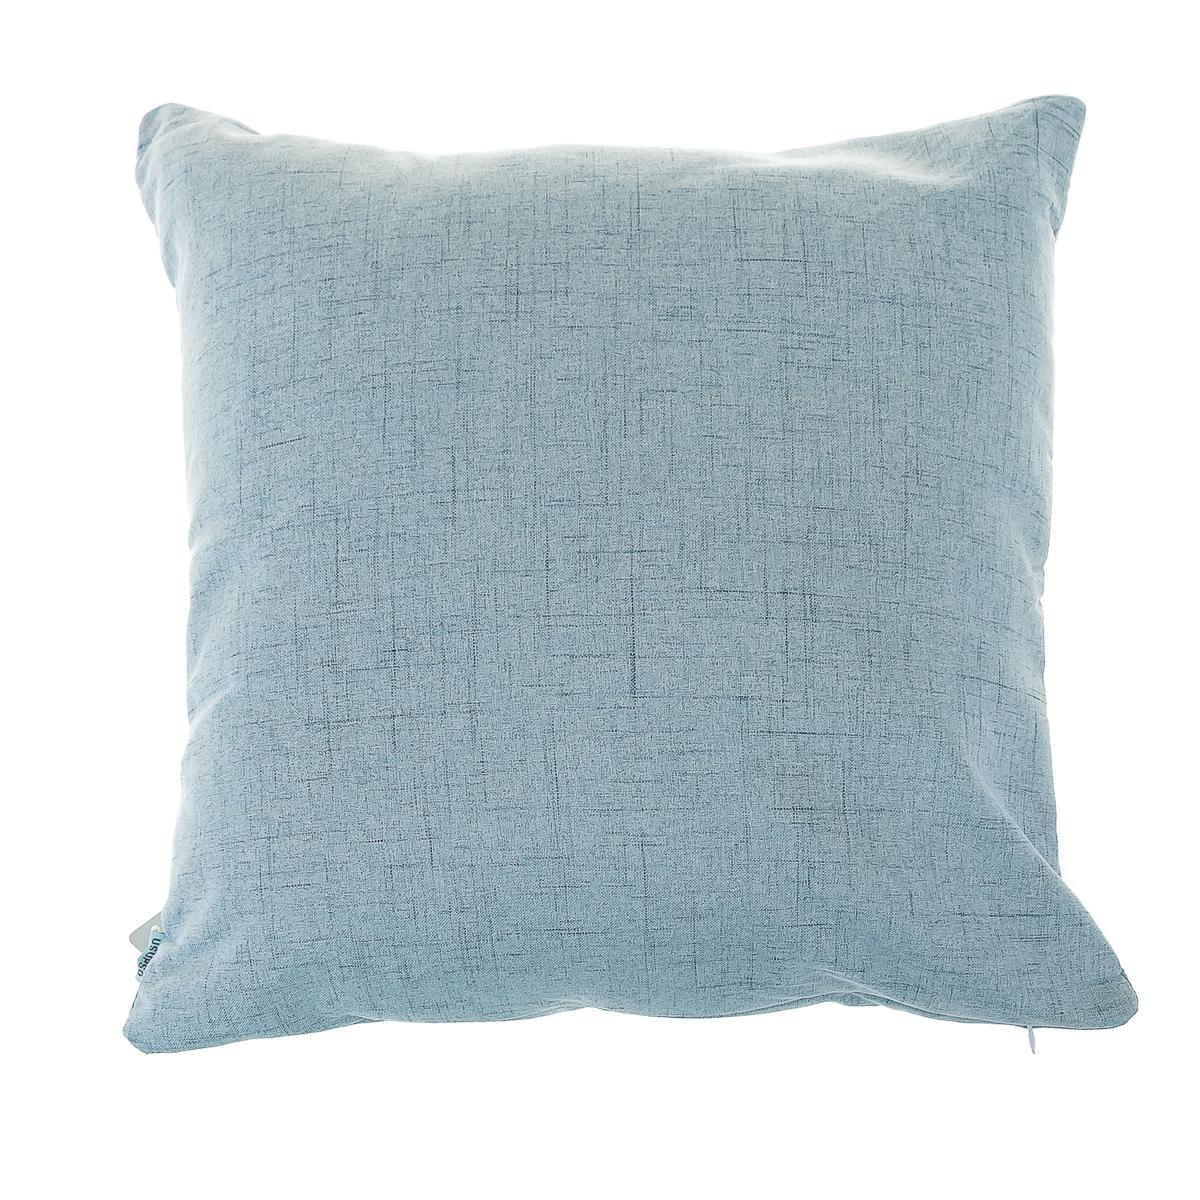 Подушка диванная льняная, голубая